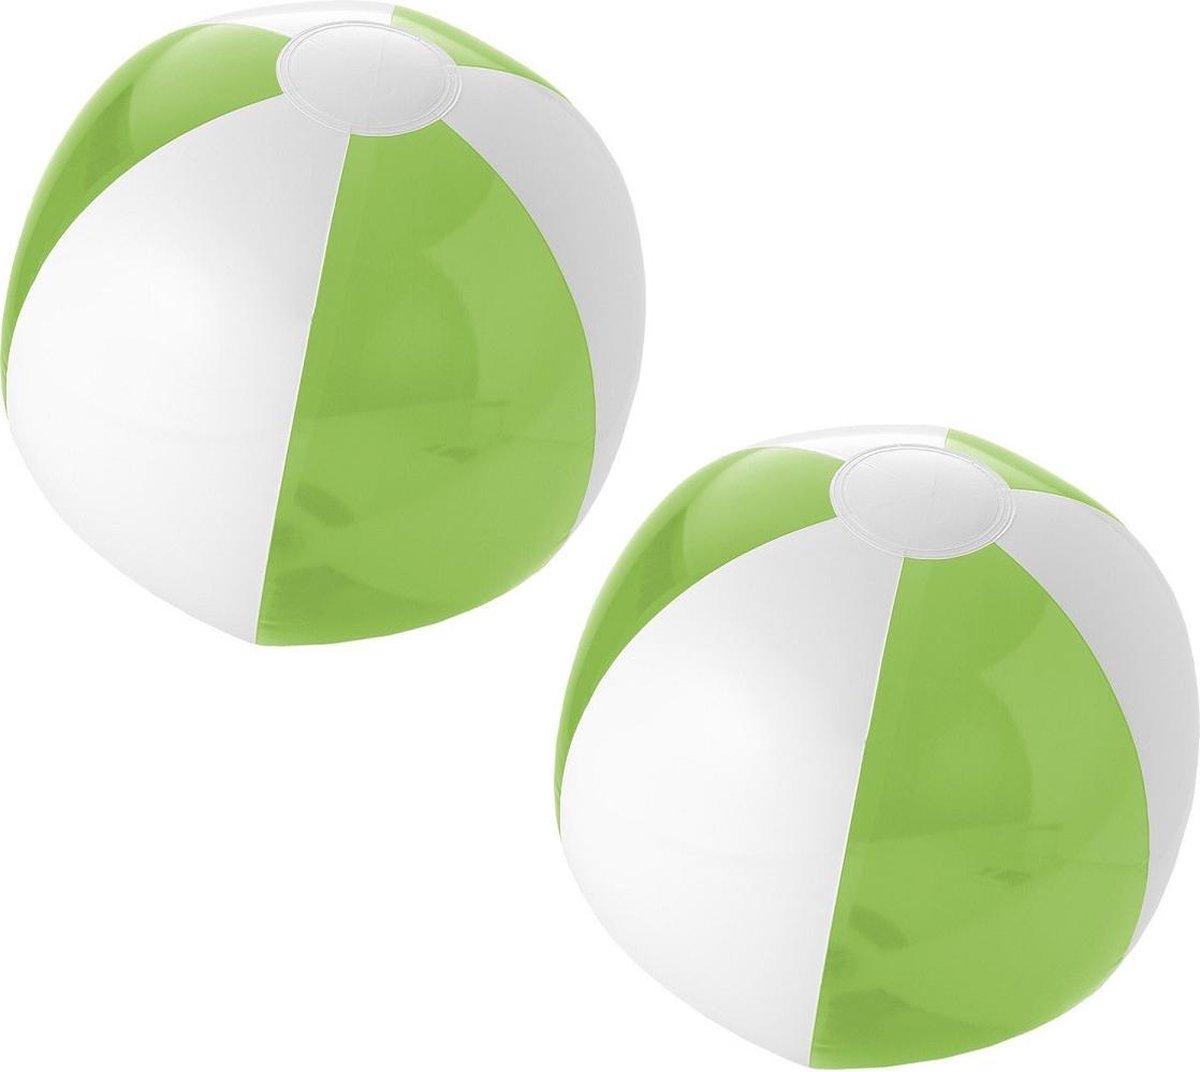 5x stuks opblaasbare strandballen groen/wit 30 cm - Buitenspeelgoed waterspeelgoed opblaasbaar